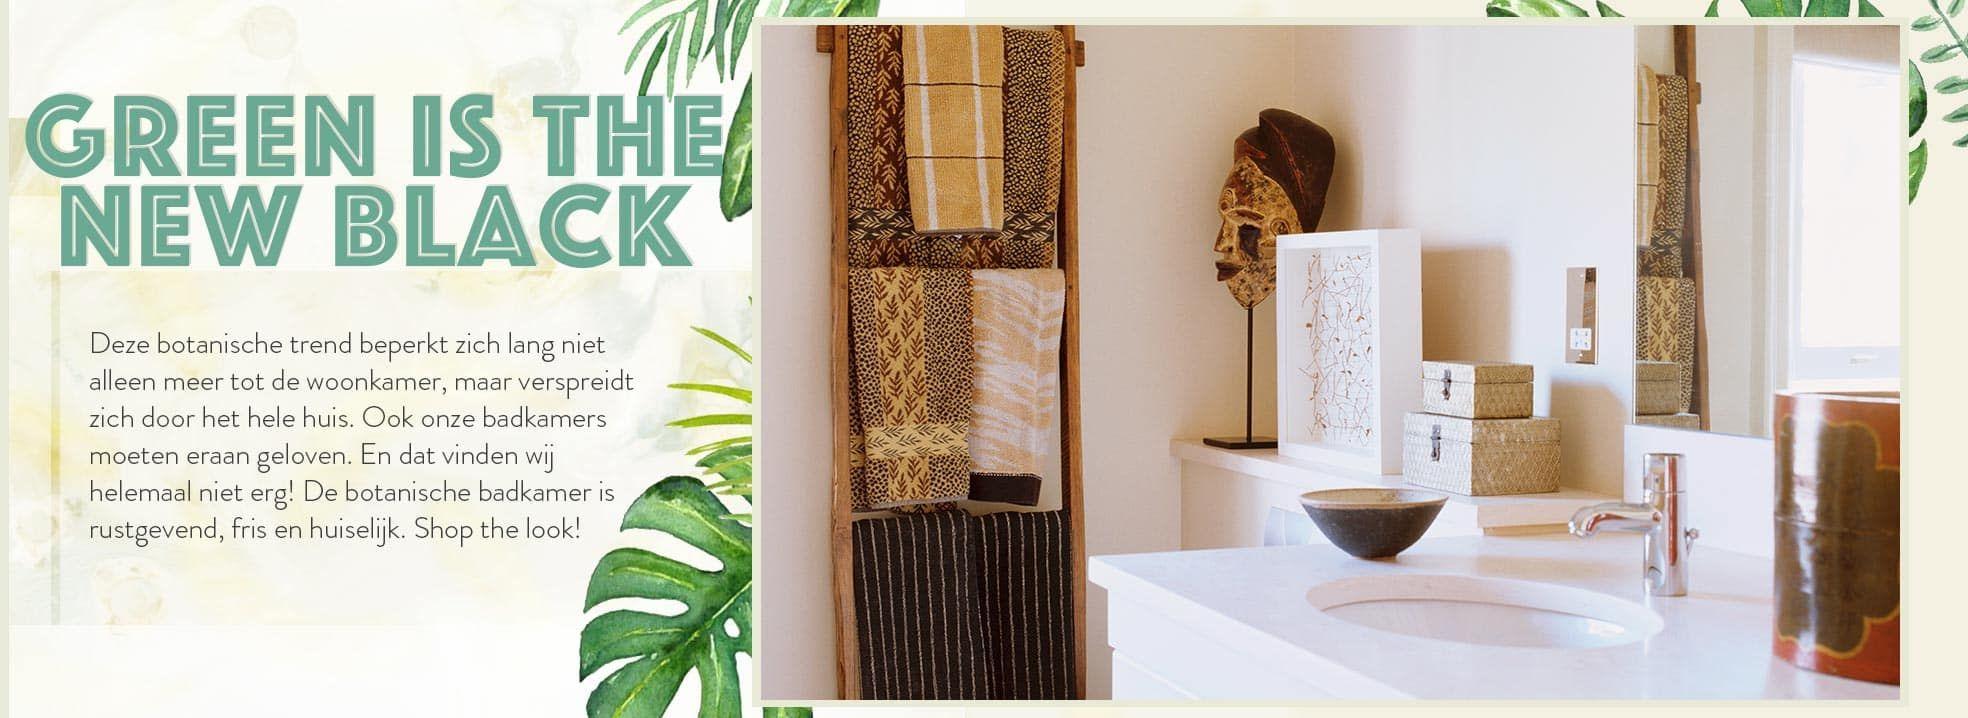 Botanisch baden | Sale bij Westwing | Badkamer ideeën | Pinterest